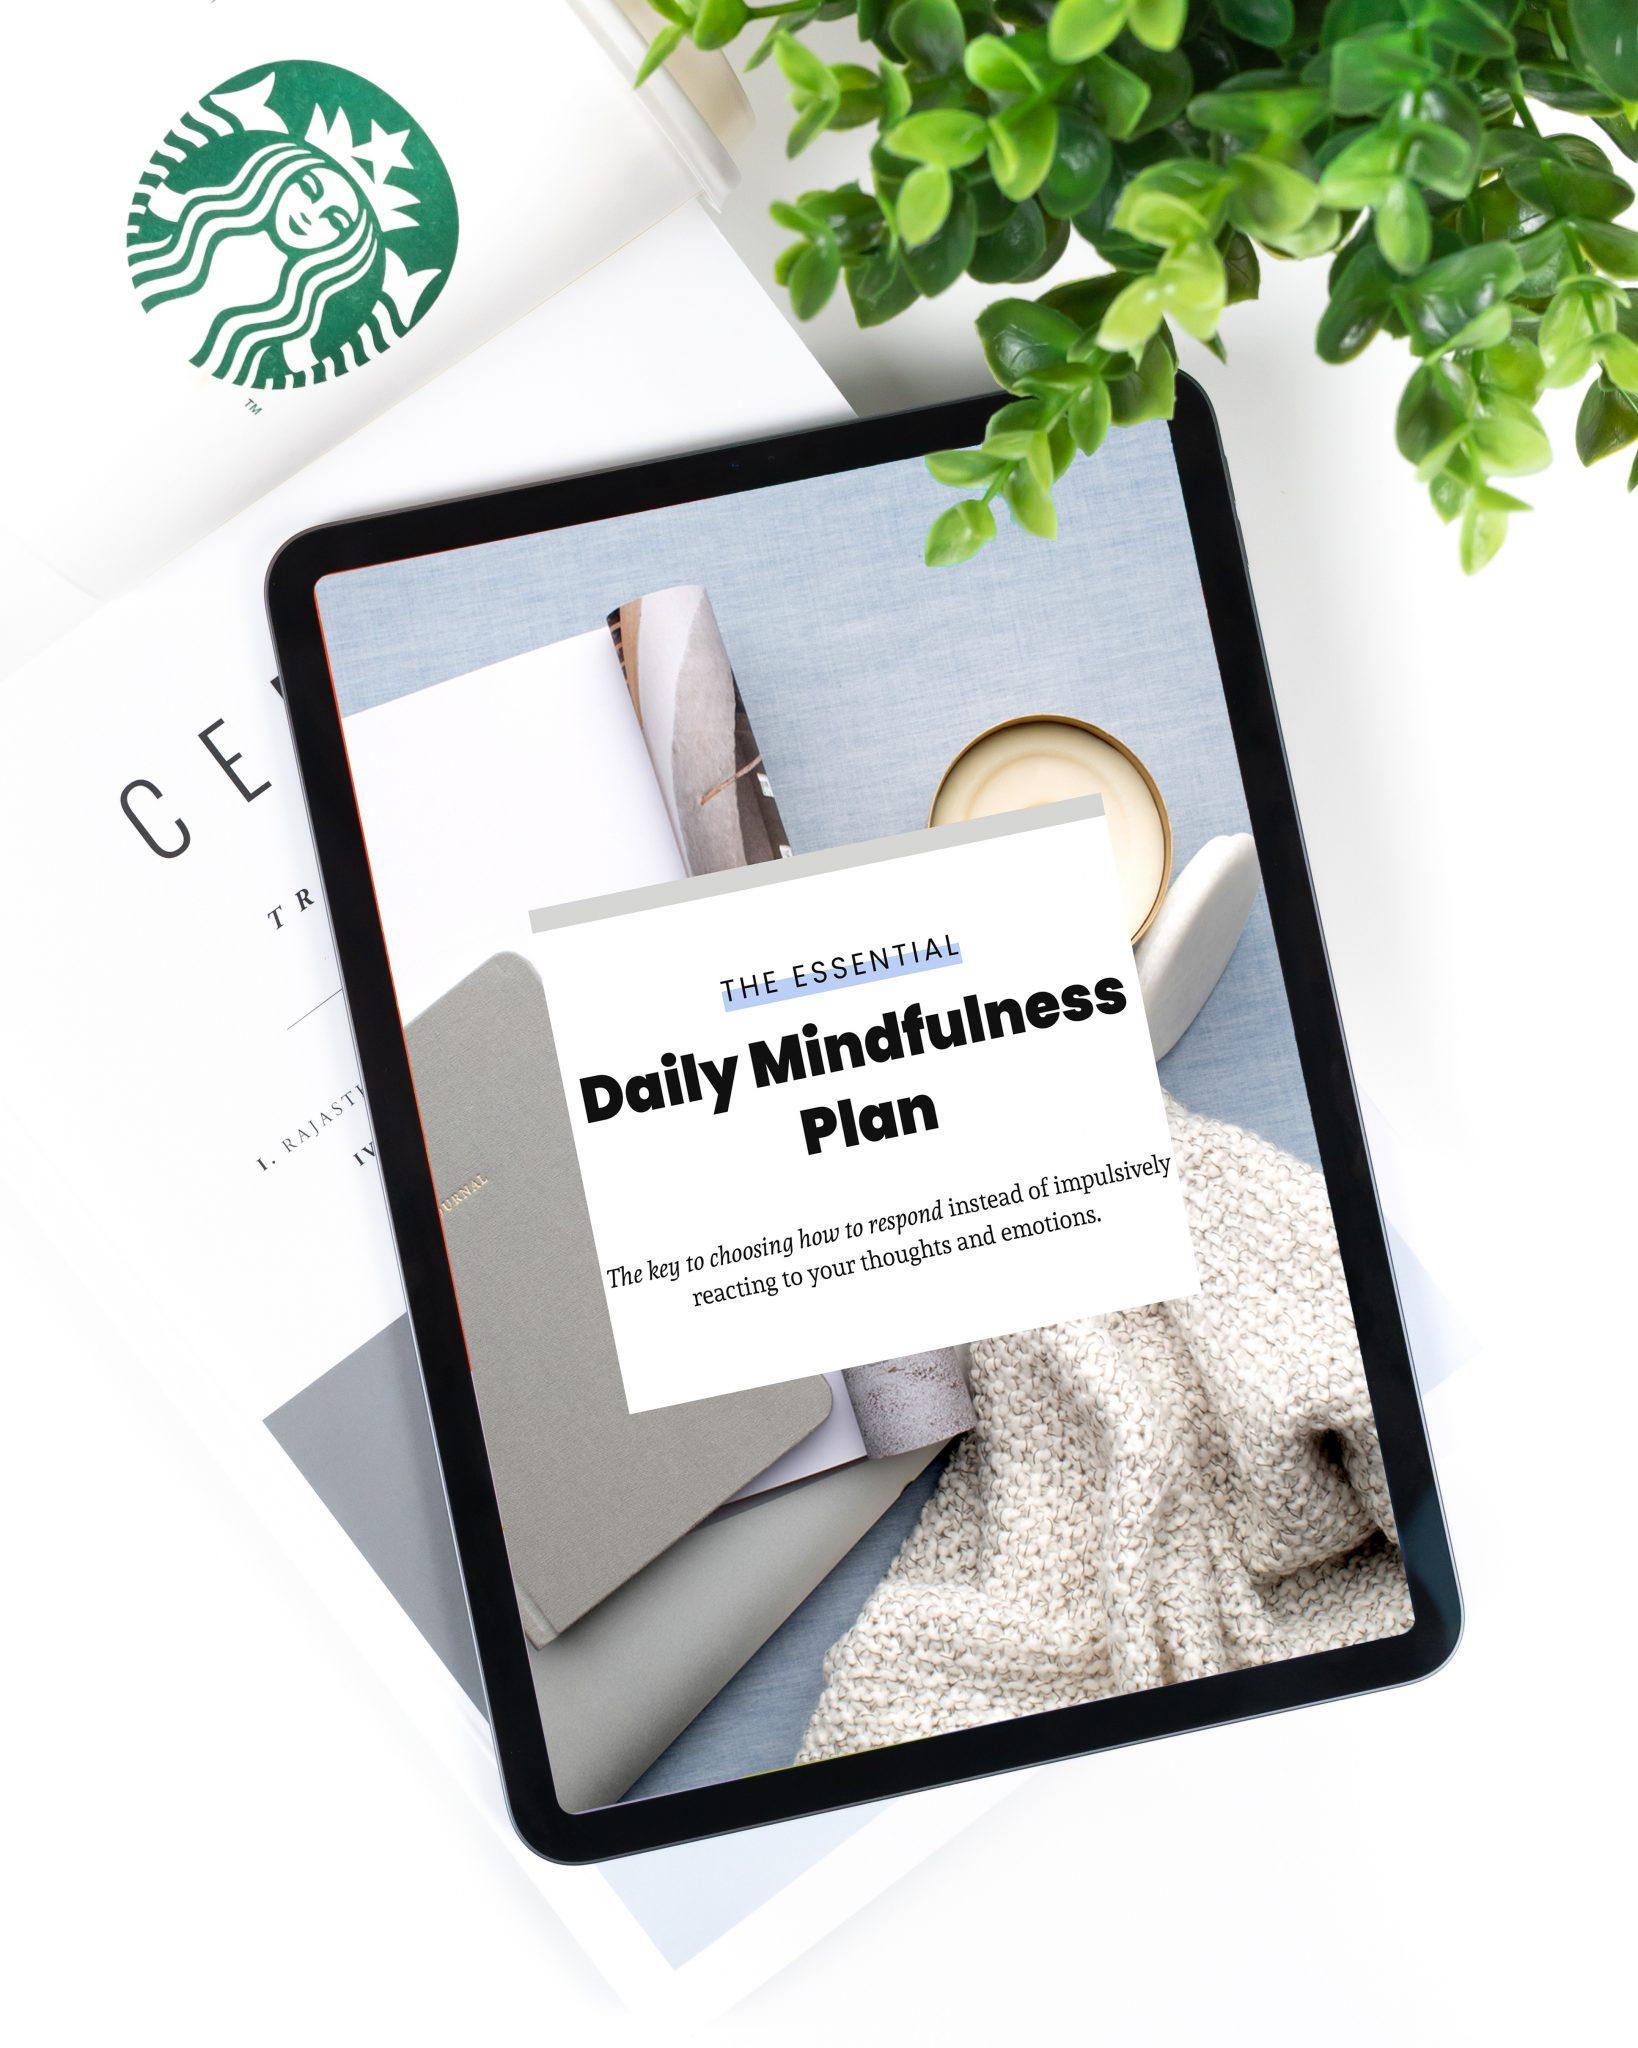 Daily Mindfulness Plan